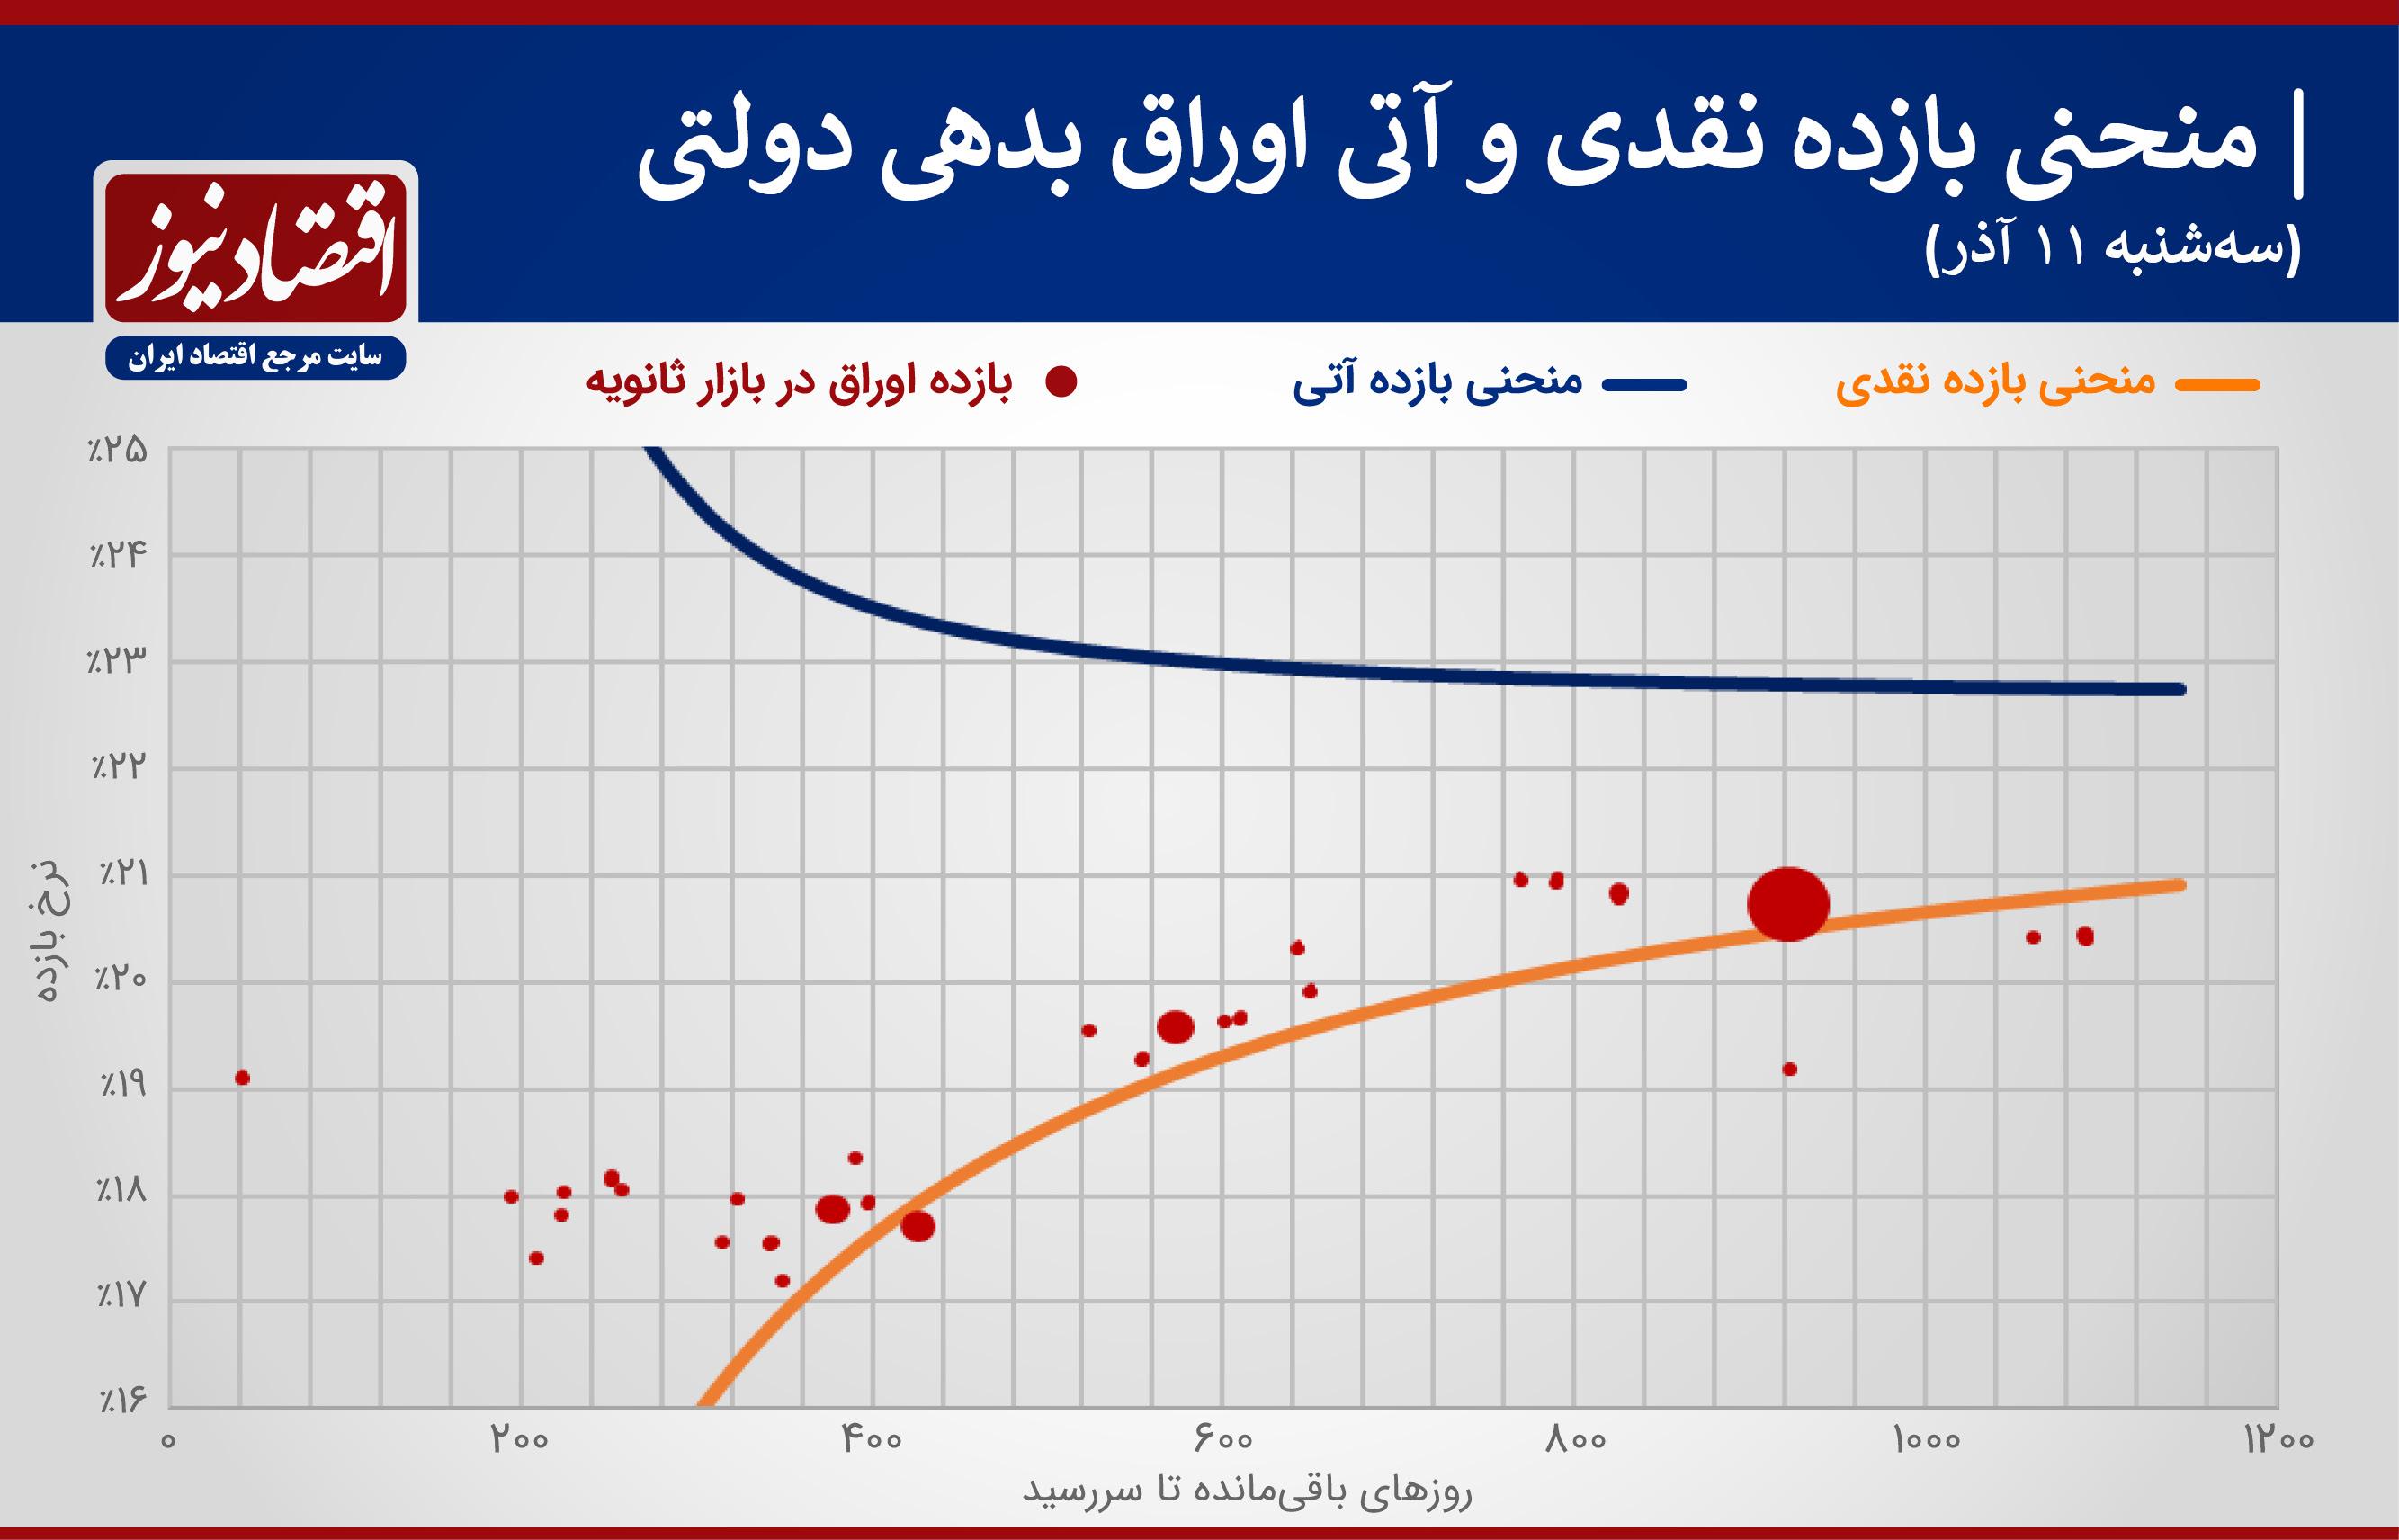 منحنی اوراق بدهی11 آذر